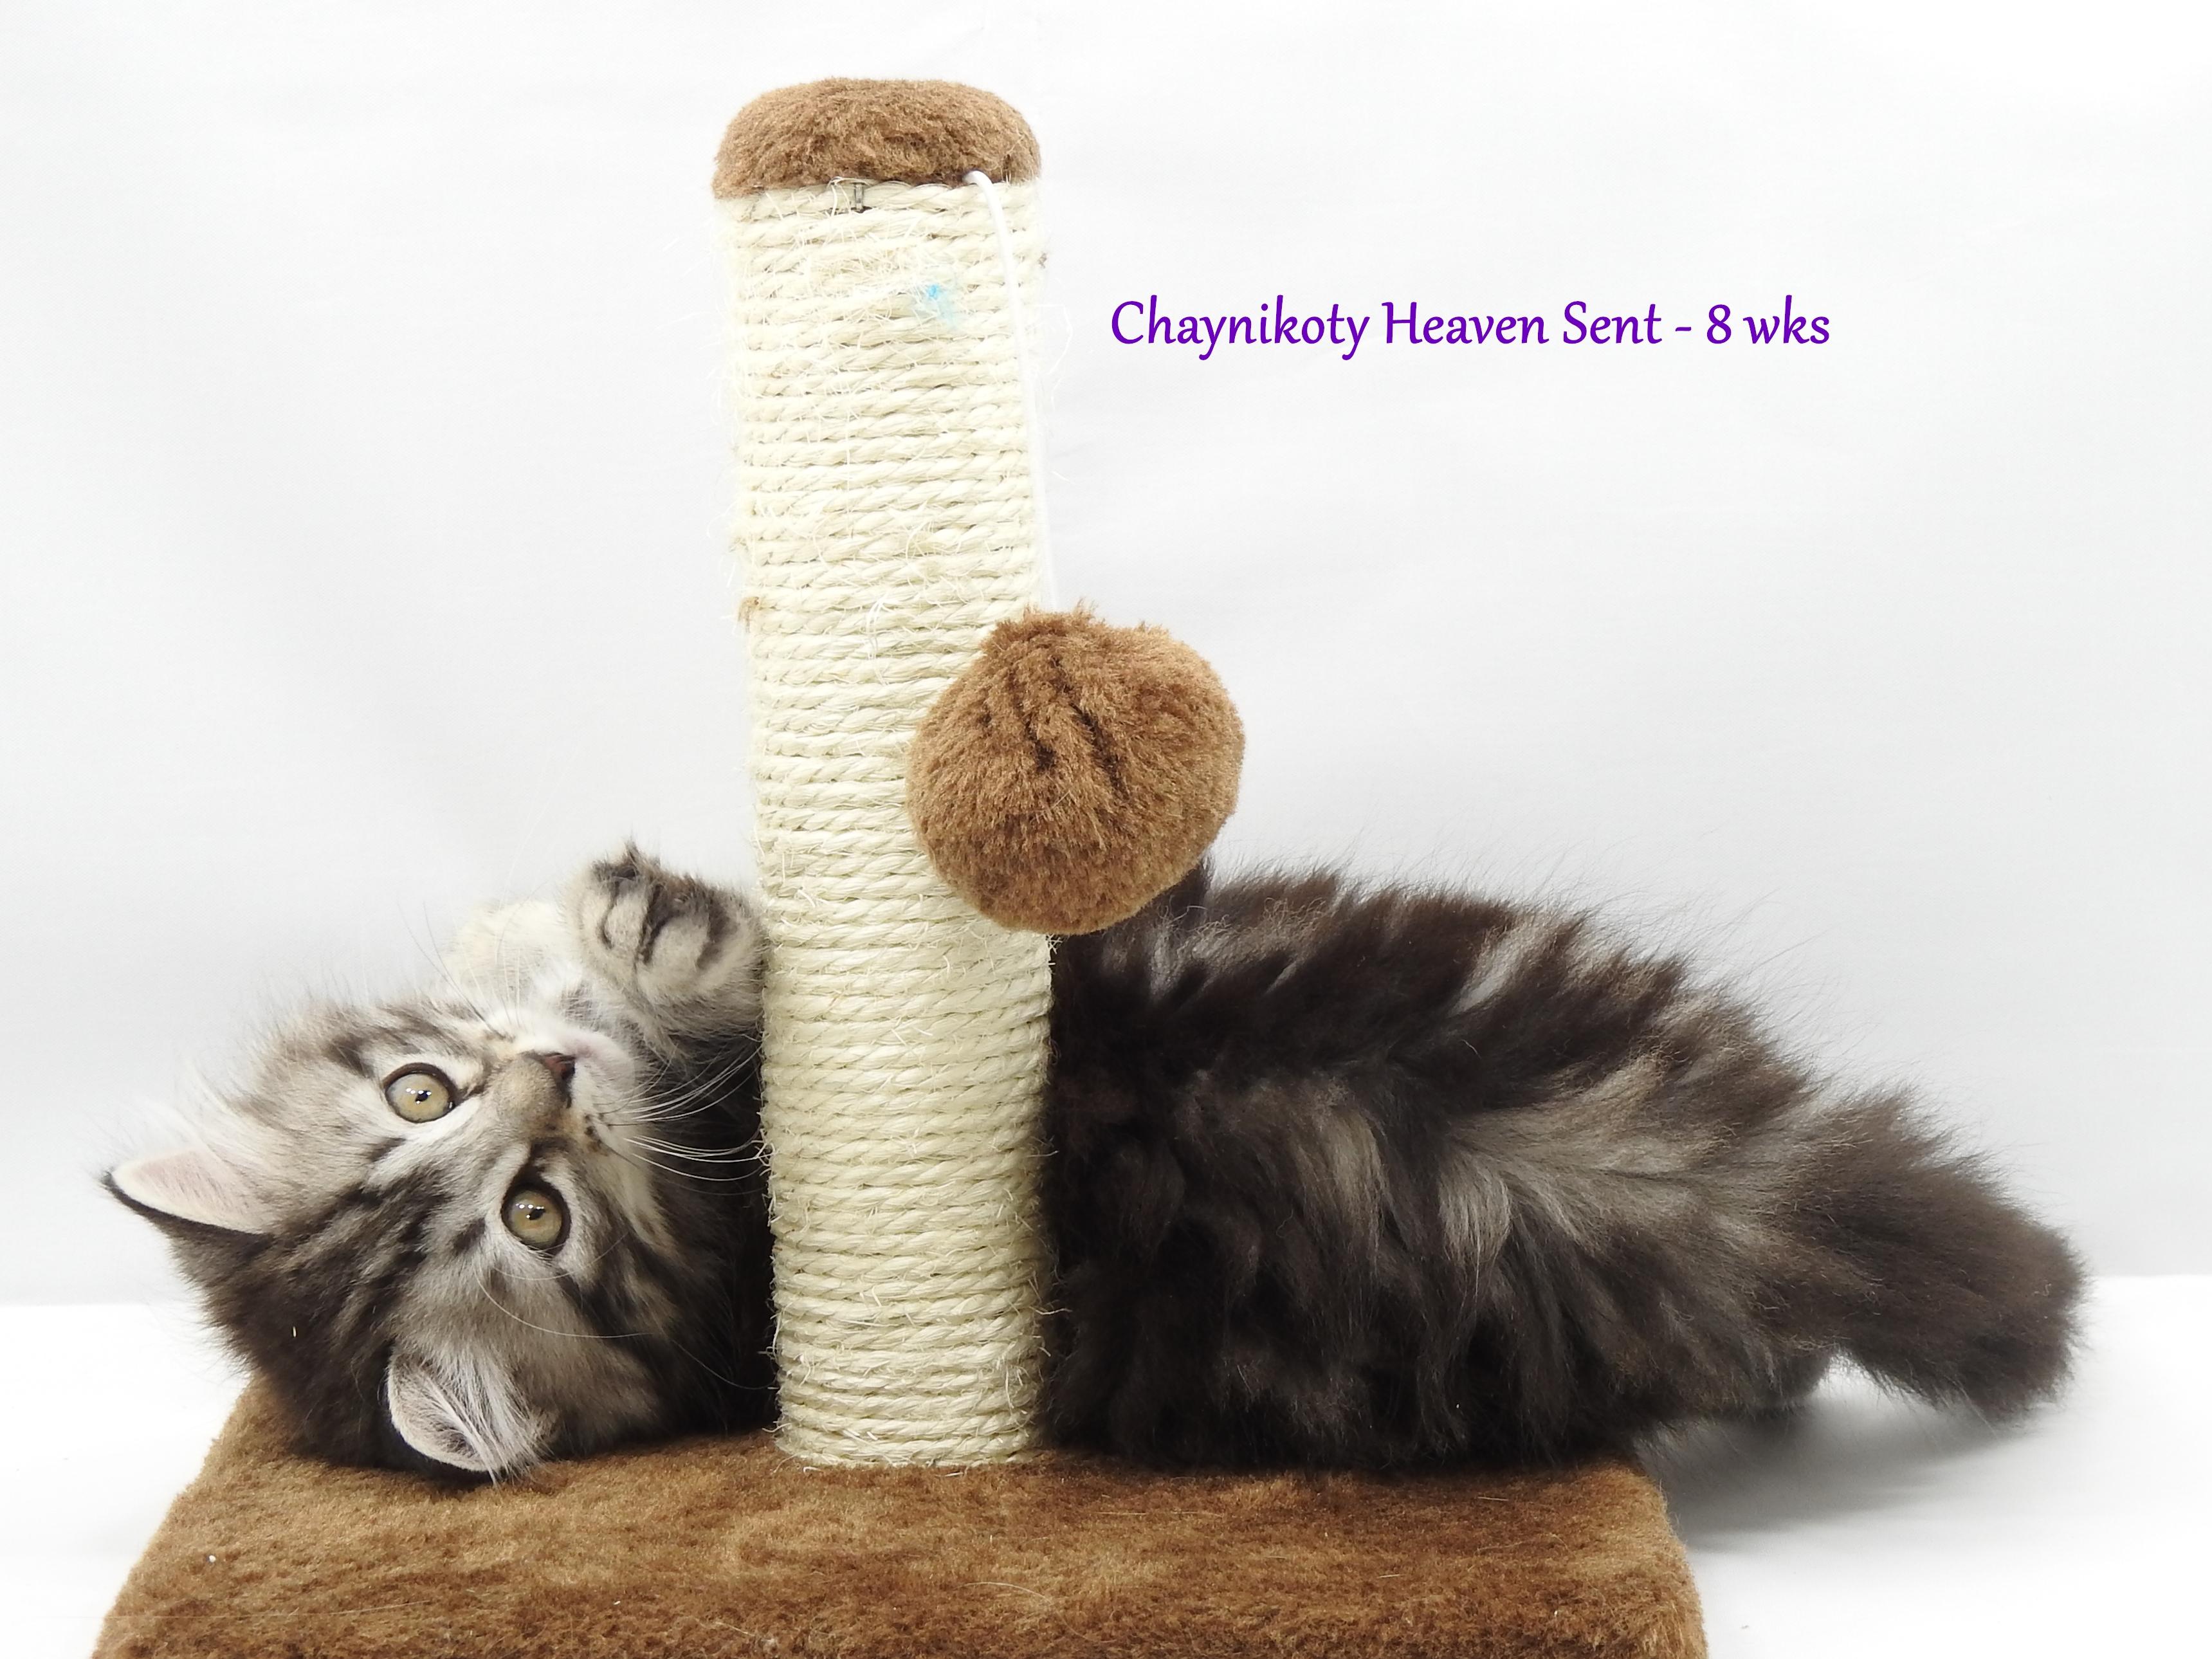 Chaynikoty Heaven Sent